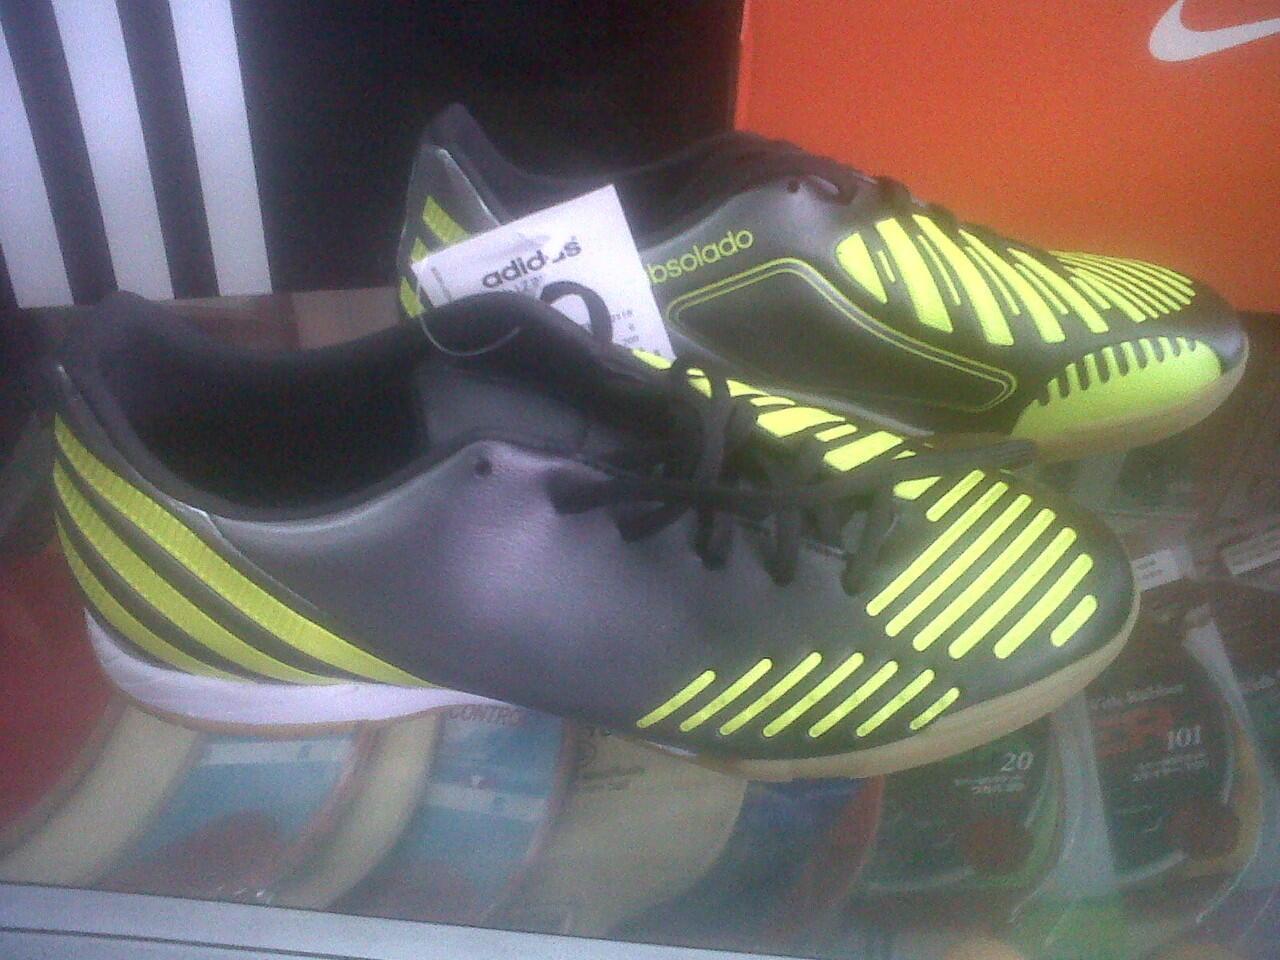 WTS jual sepatu New Adidas Predator Absolado LZ in 100% ori ( Steven gerrard )